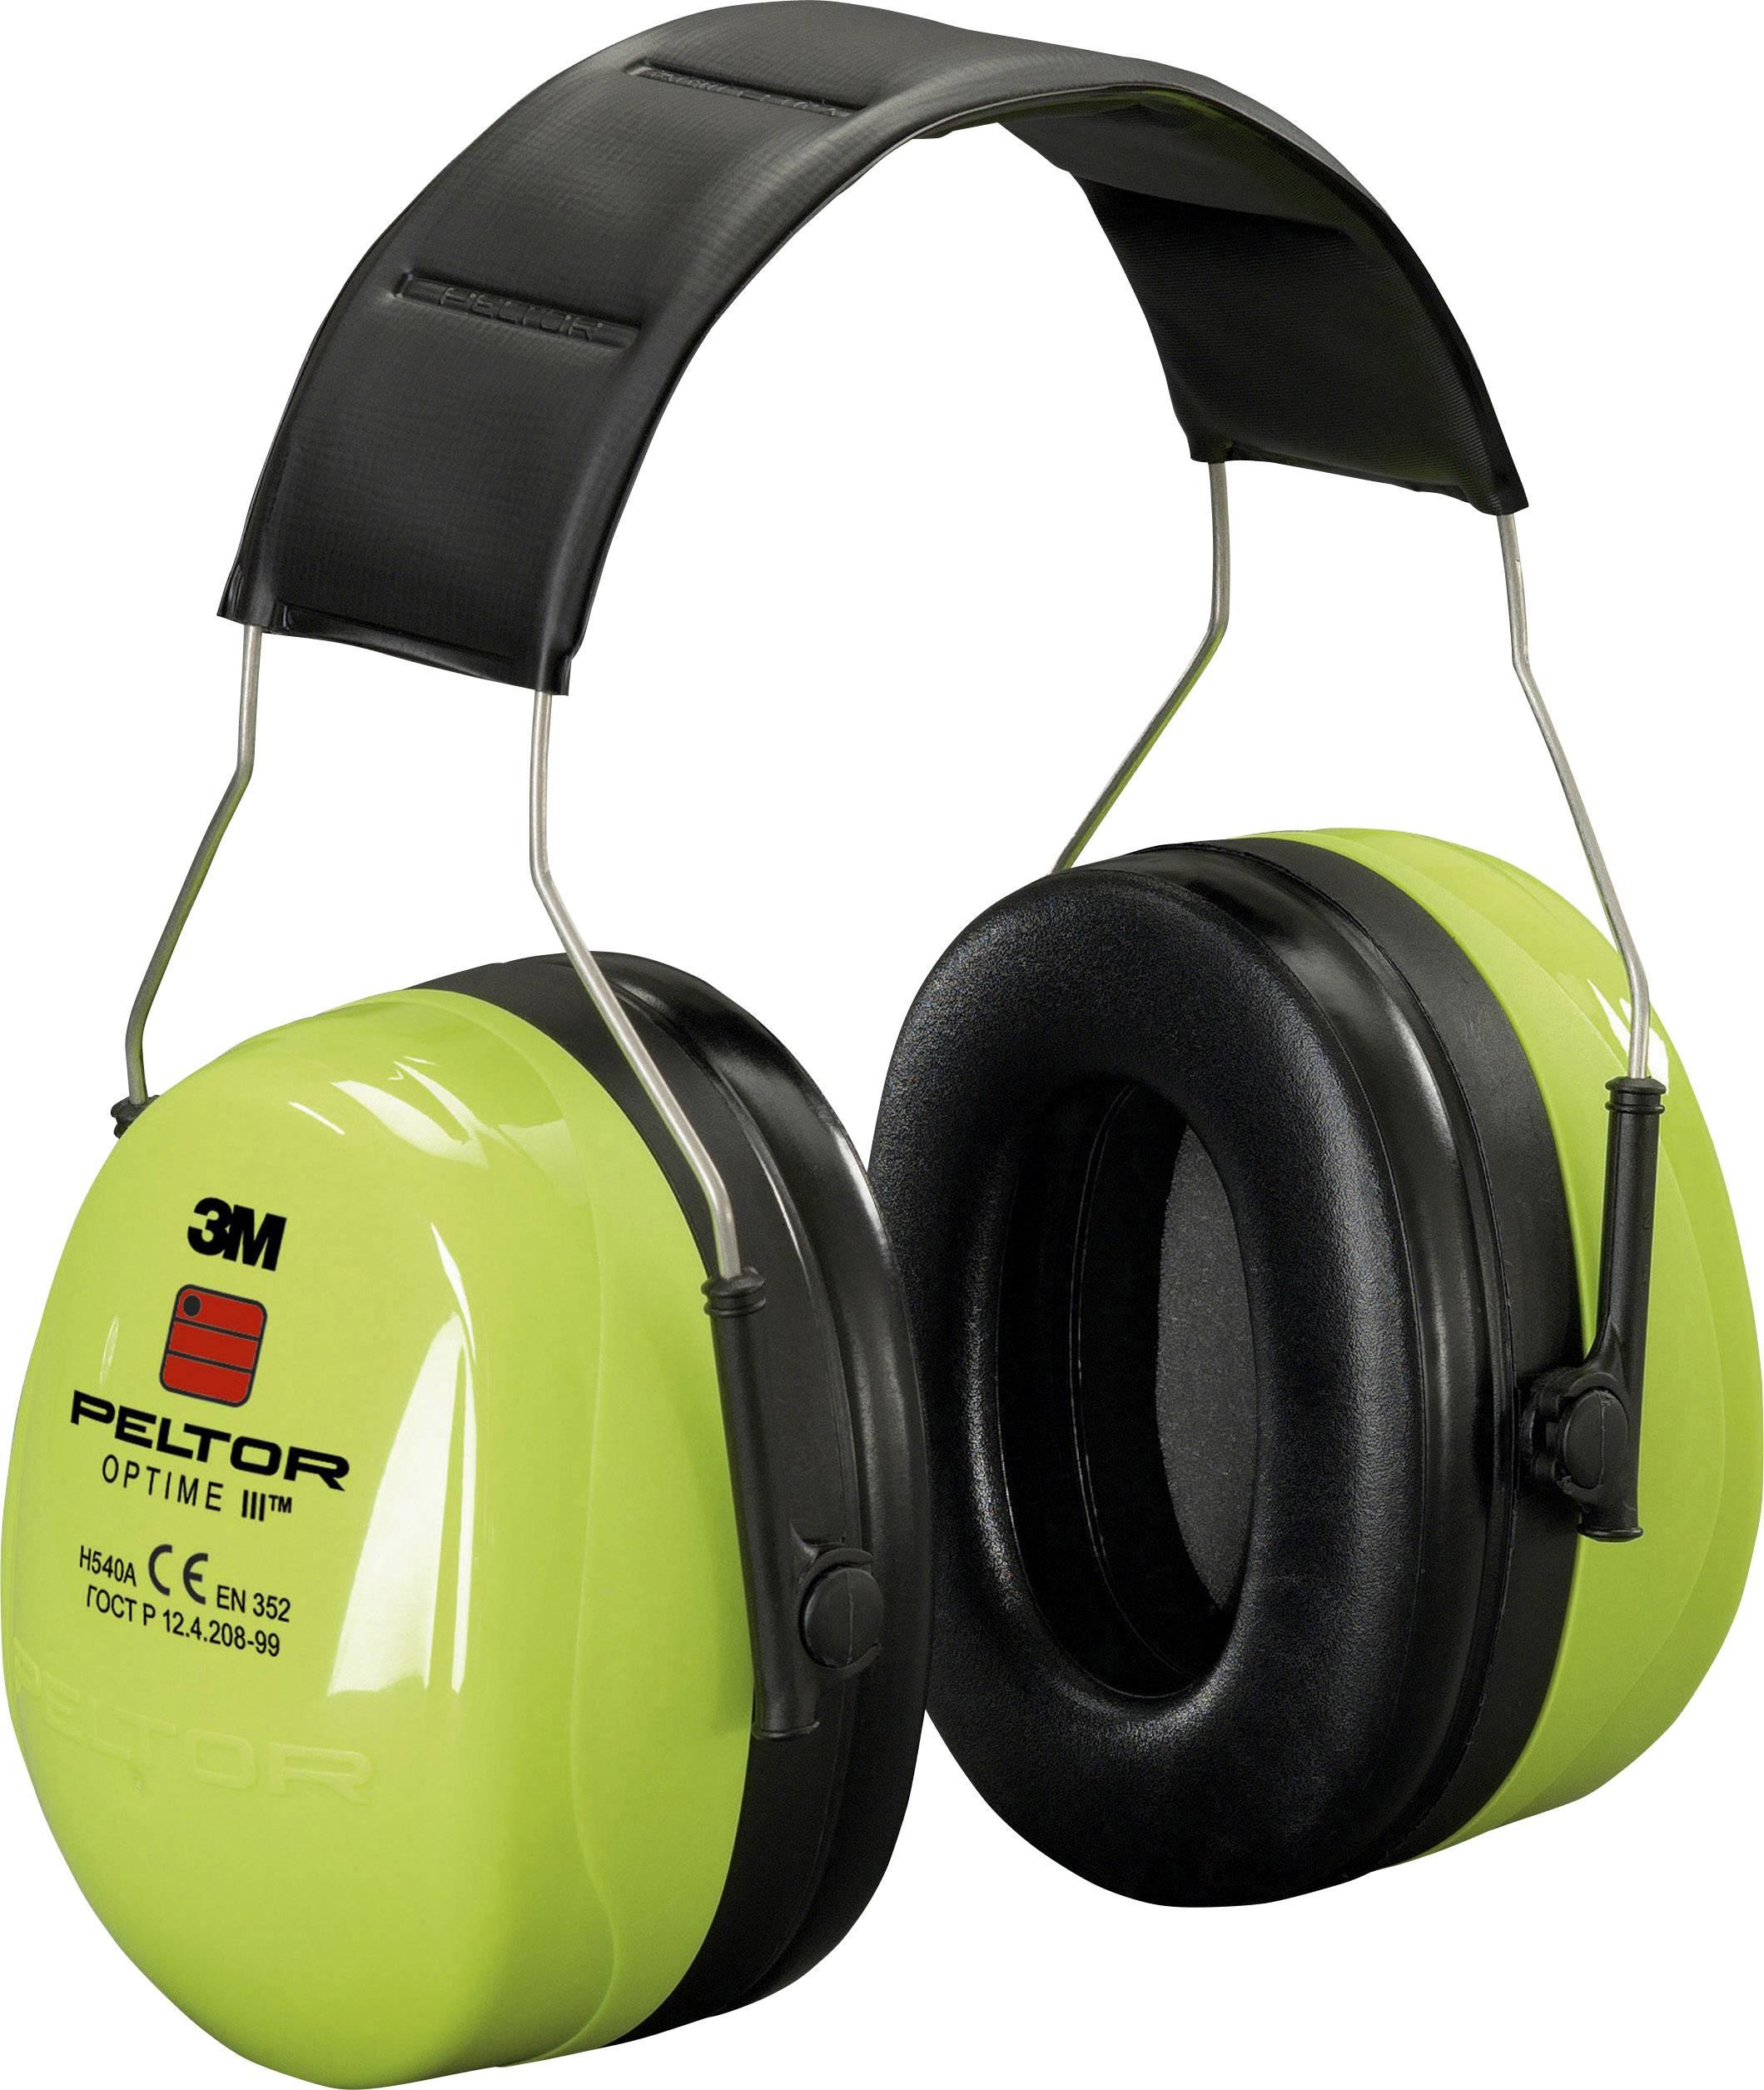 Mušlový chránič sluchu 3M Peltor Optime III HVS H540AV, 35 dB, 1 ks